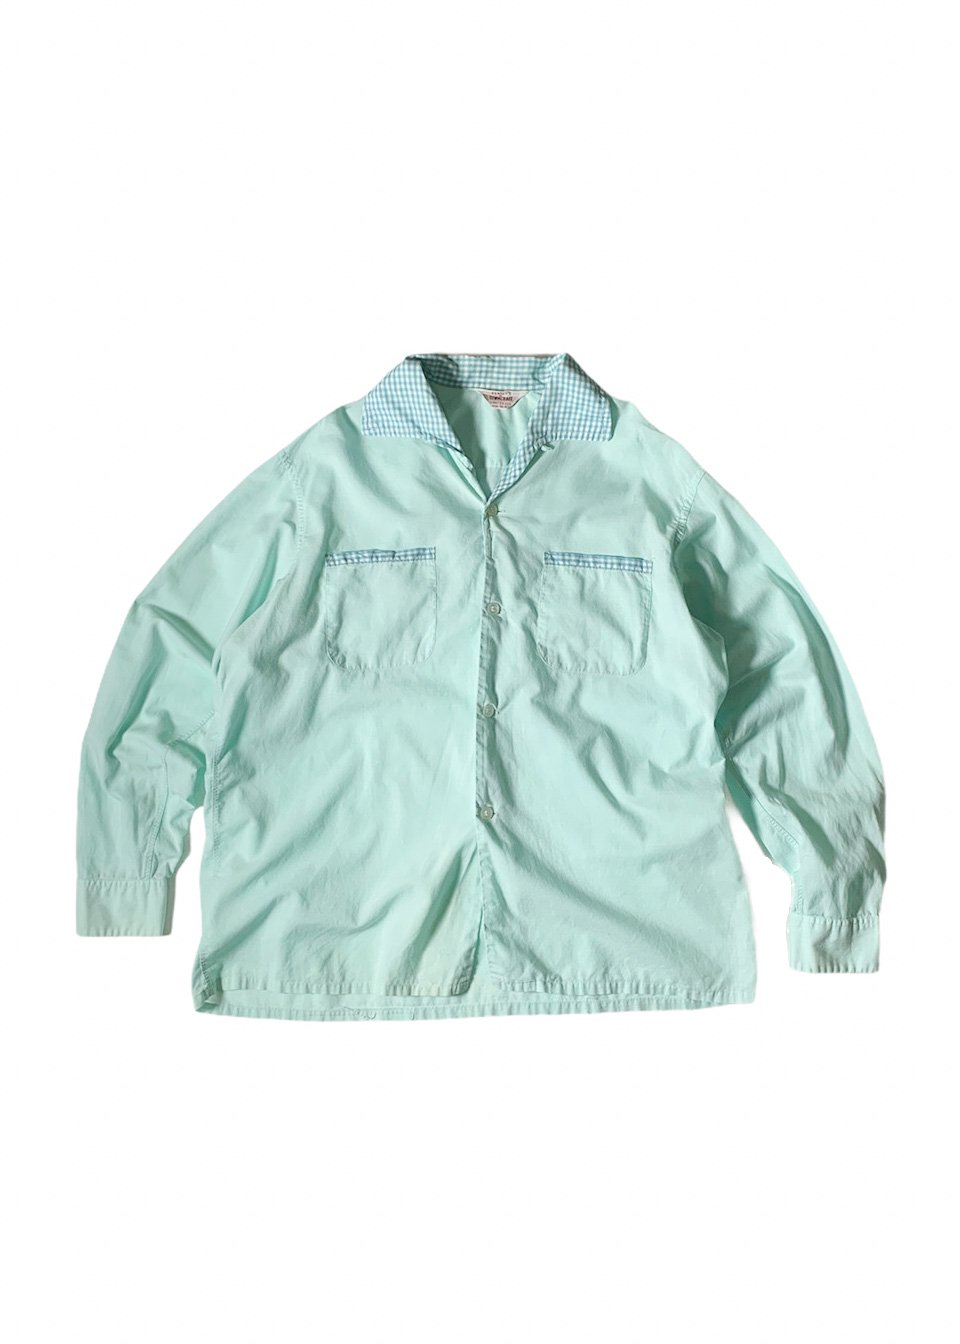 """PENNY'S TOWNCRAFT"" Pajama L/S Shirt"